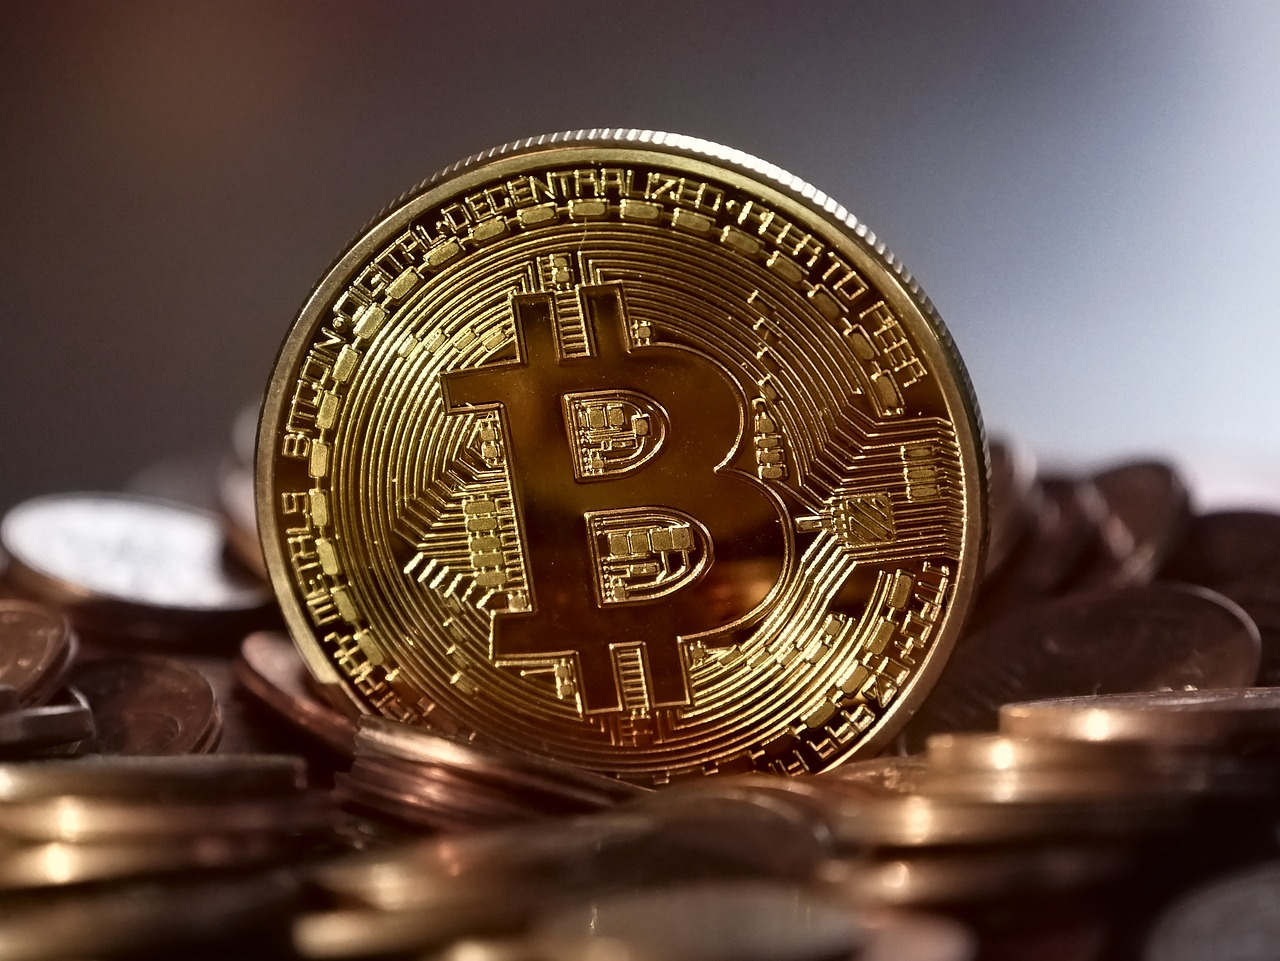 Bircoin price